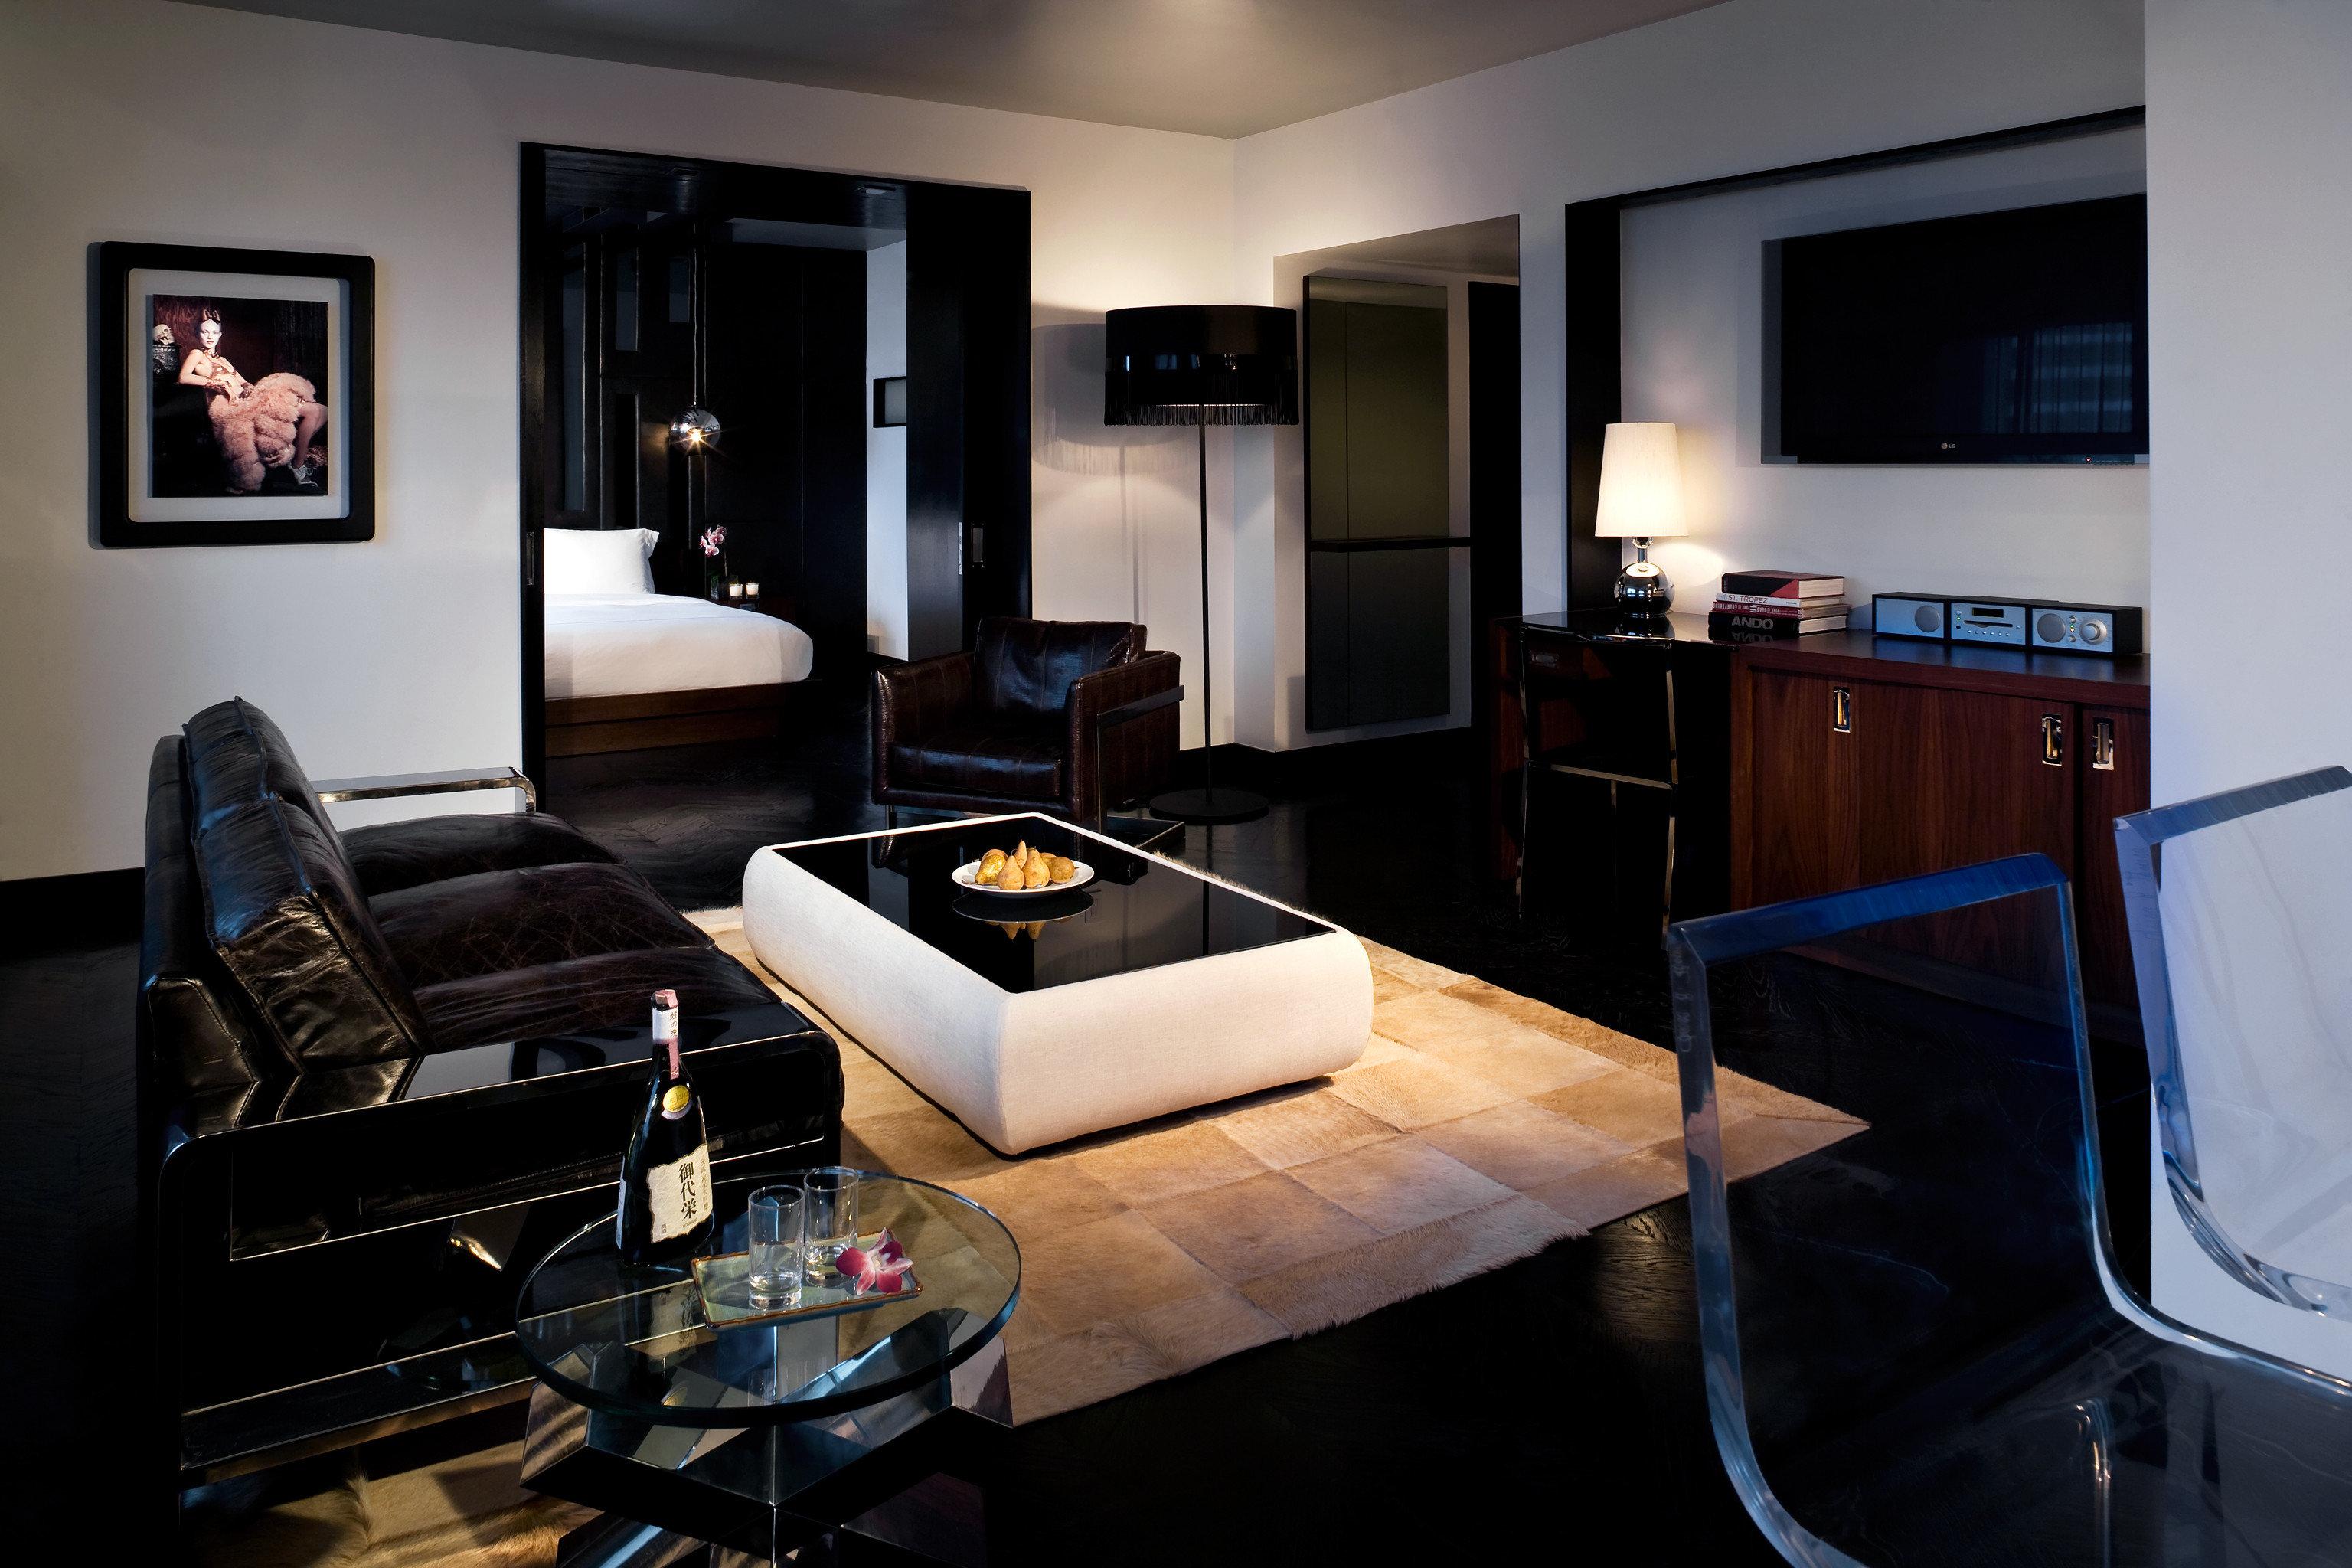 Hip Modern Nightlife Party property living room Suite home condominium flat